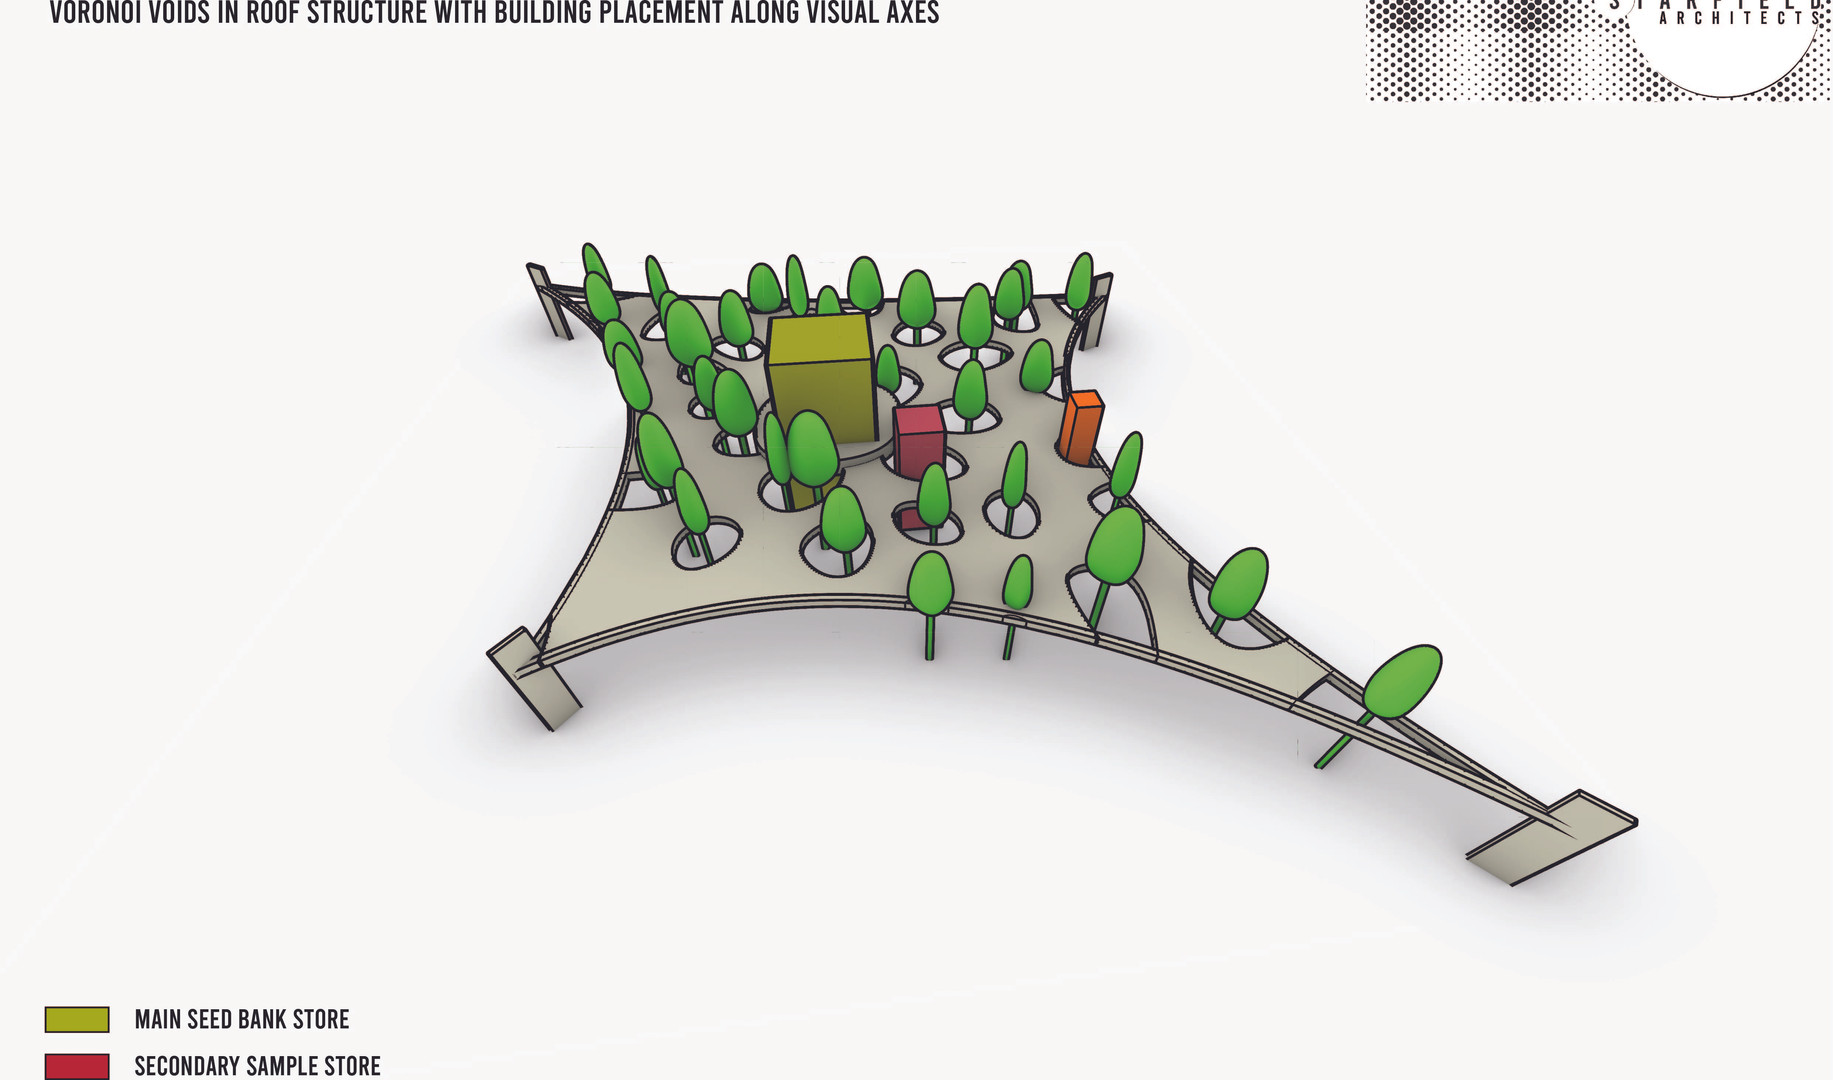 UNESCO_2020_Voronoi Seed Bank_2B.jpg